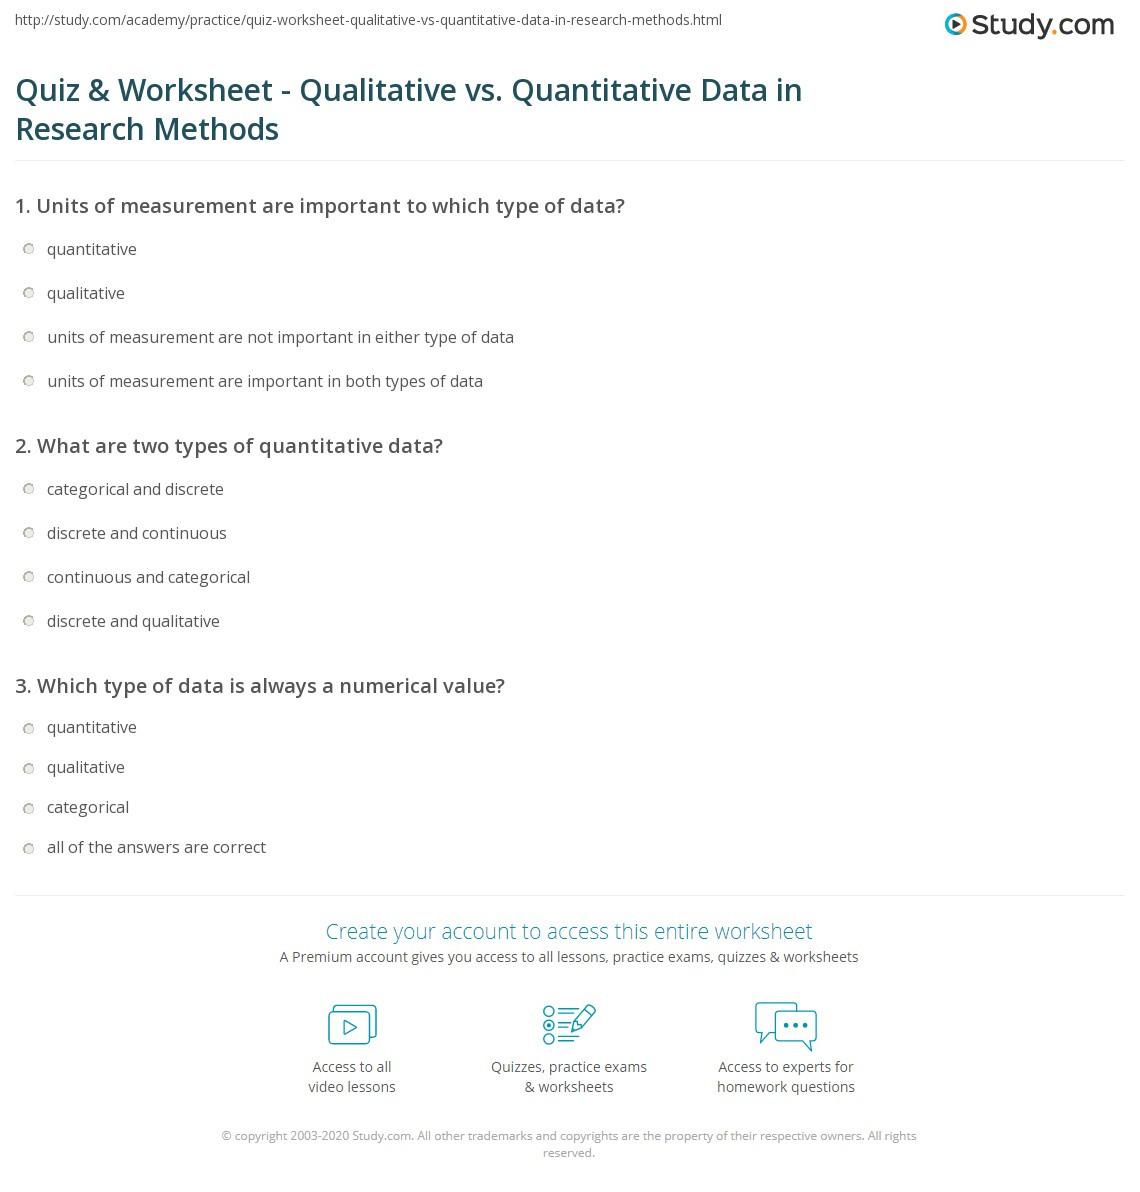 Quiz & Worksheet Qualitative vs Quantitative Data in